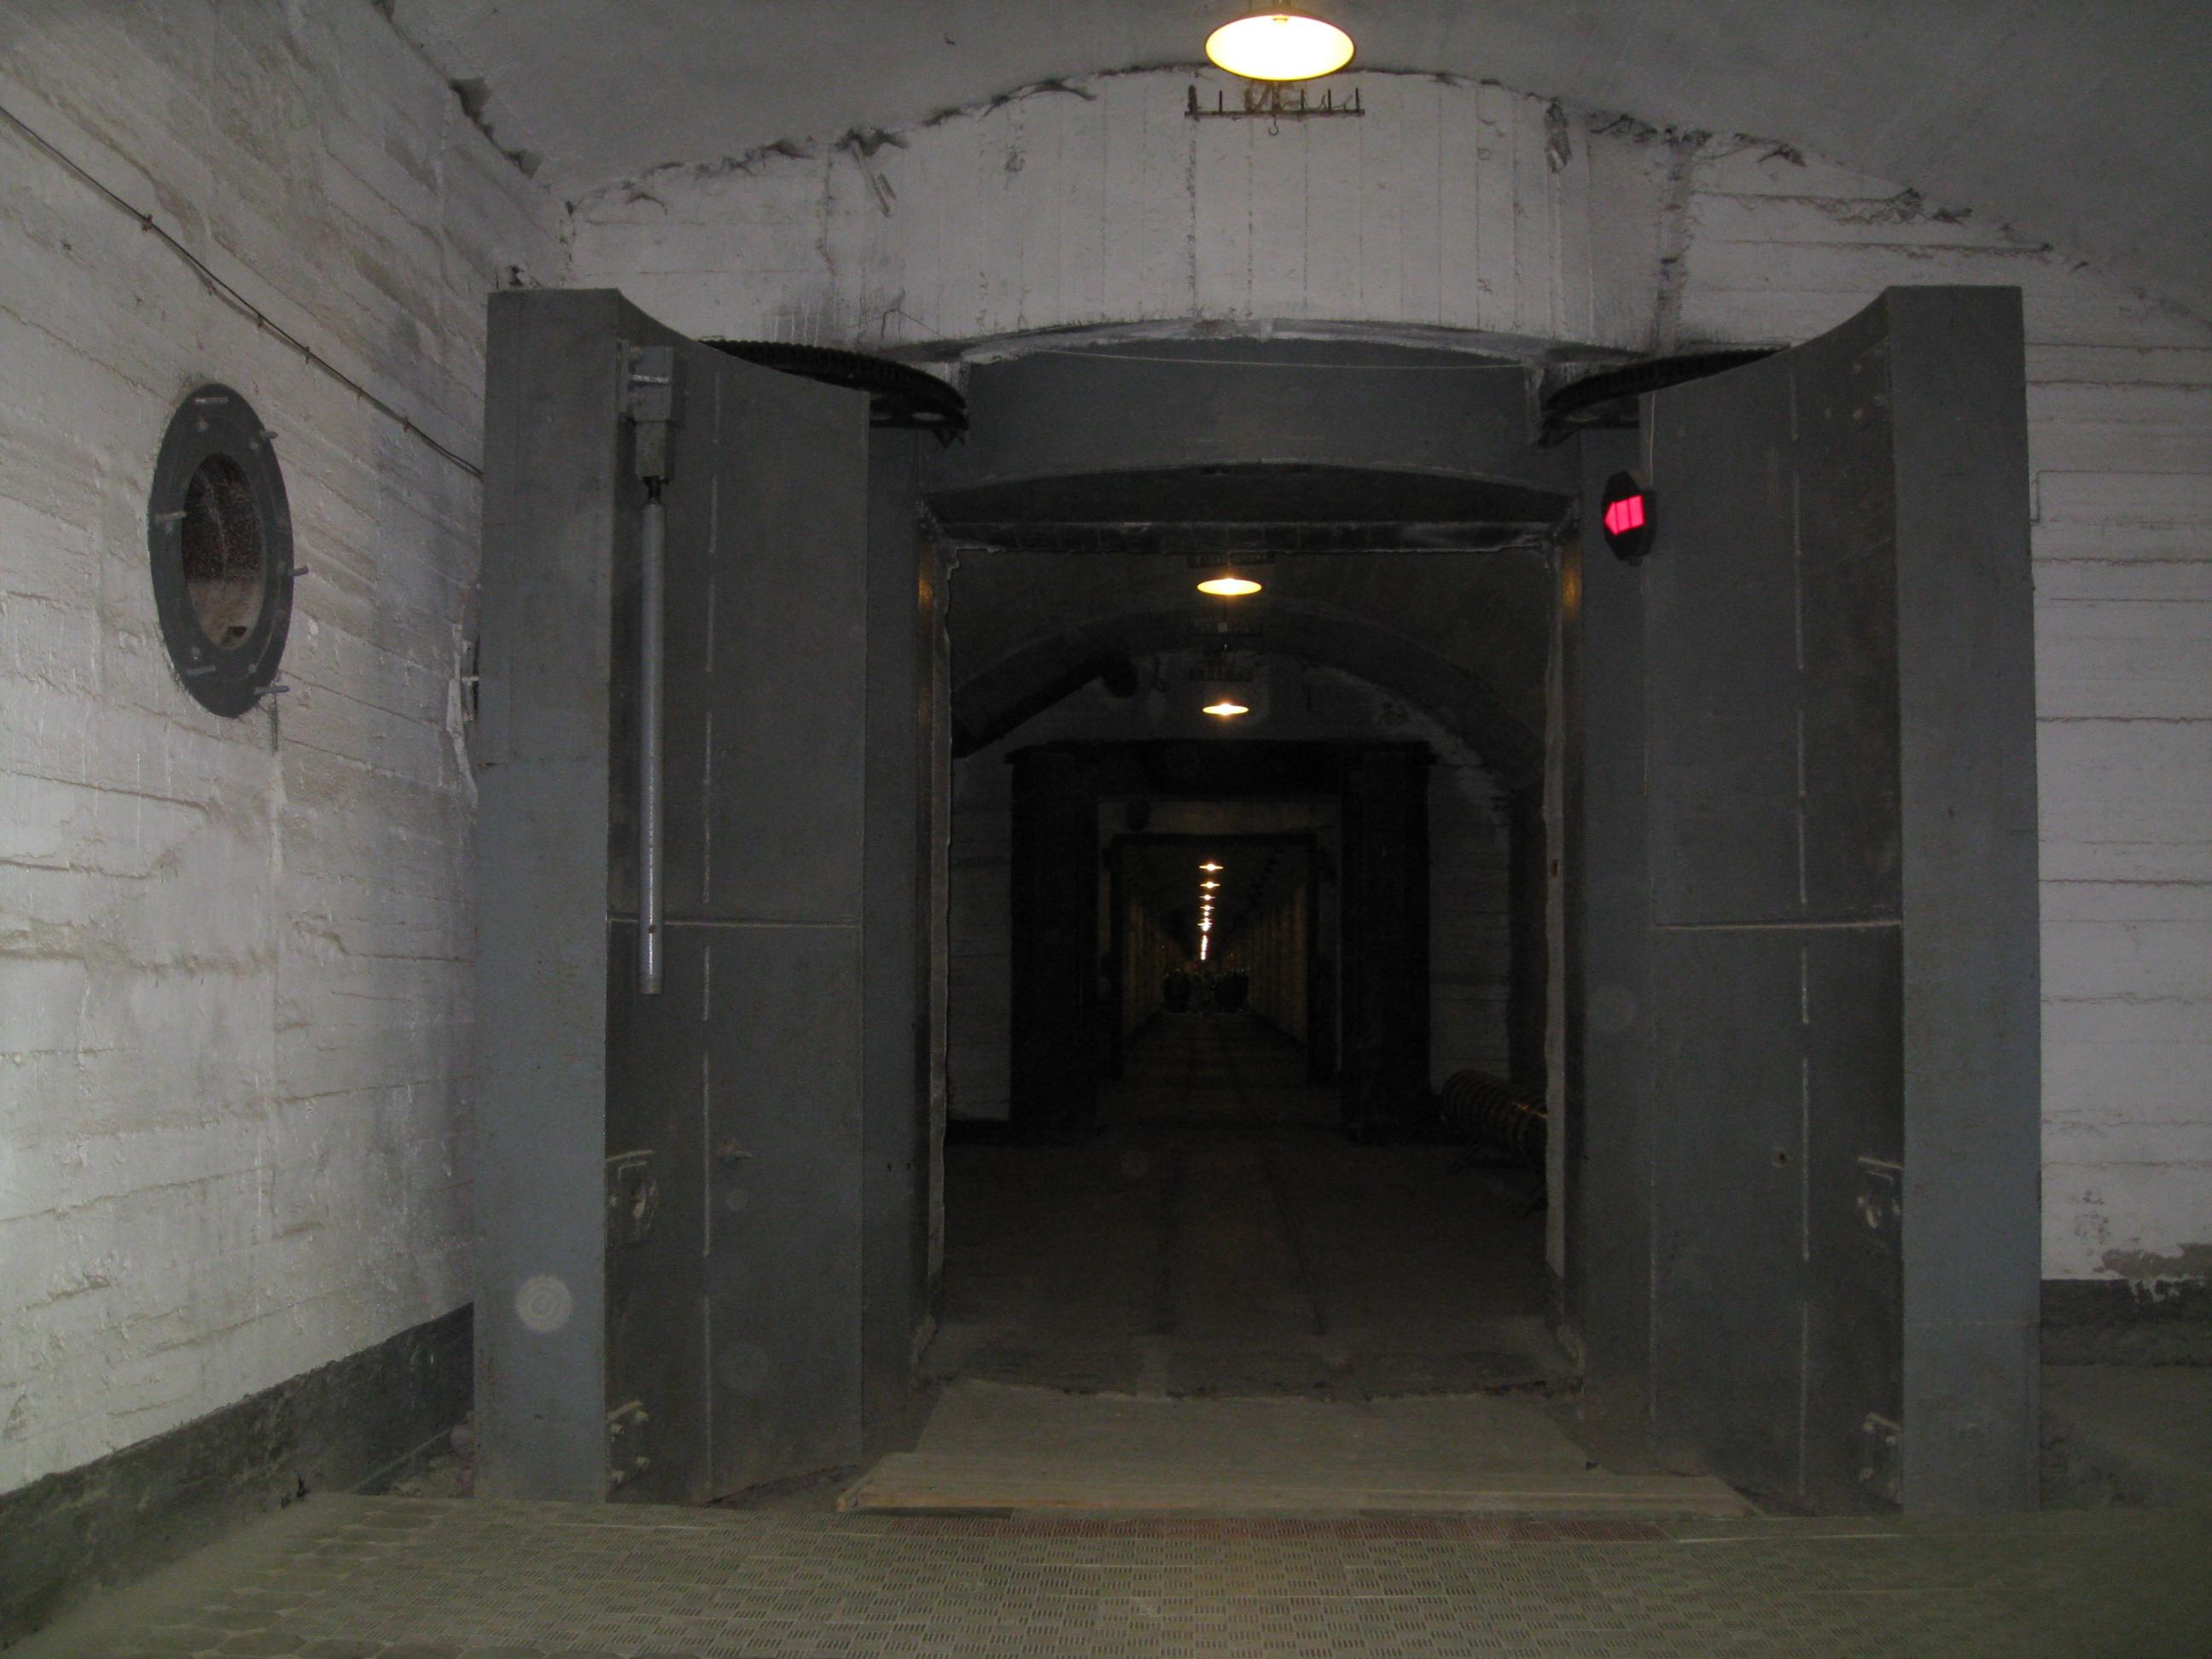 thick blast doors